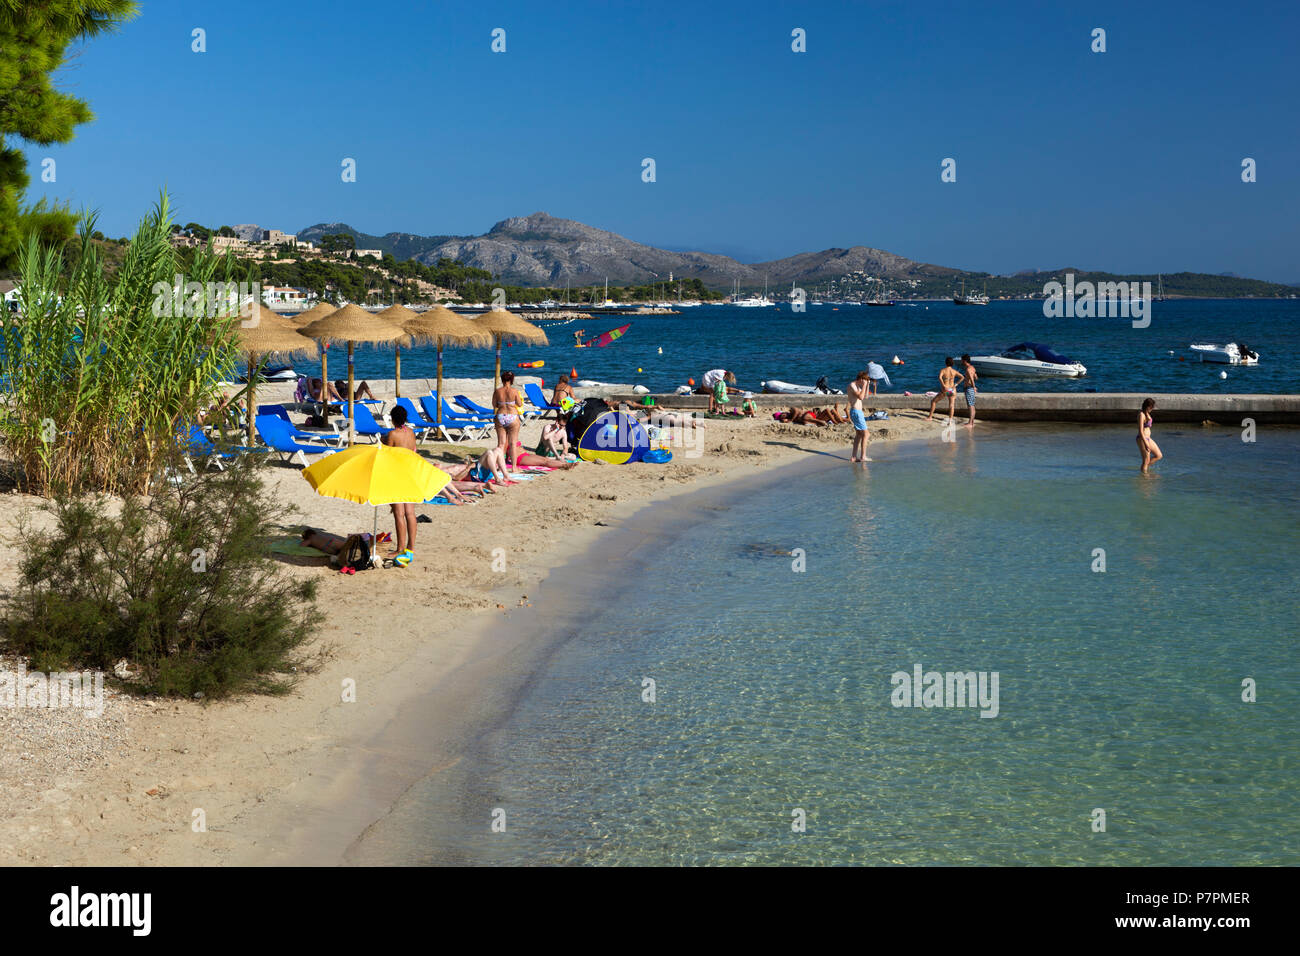 View along beach at Port de Pollenca - Stock Image